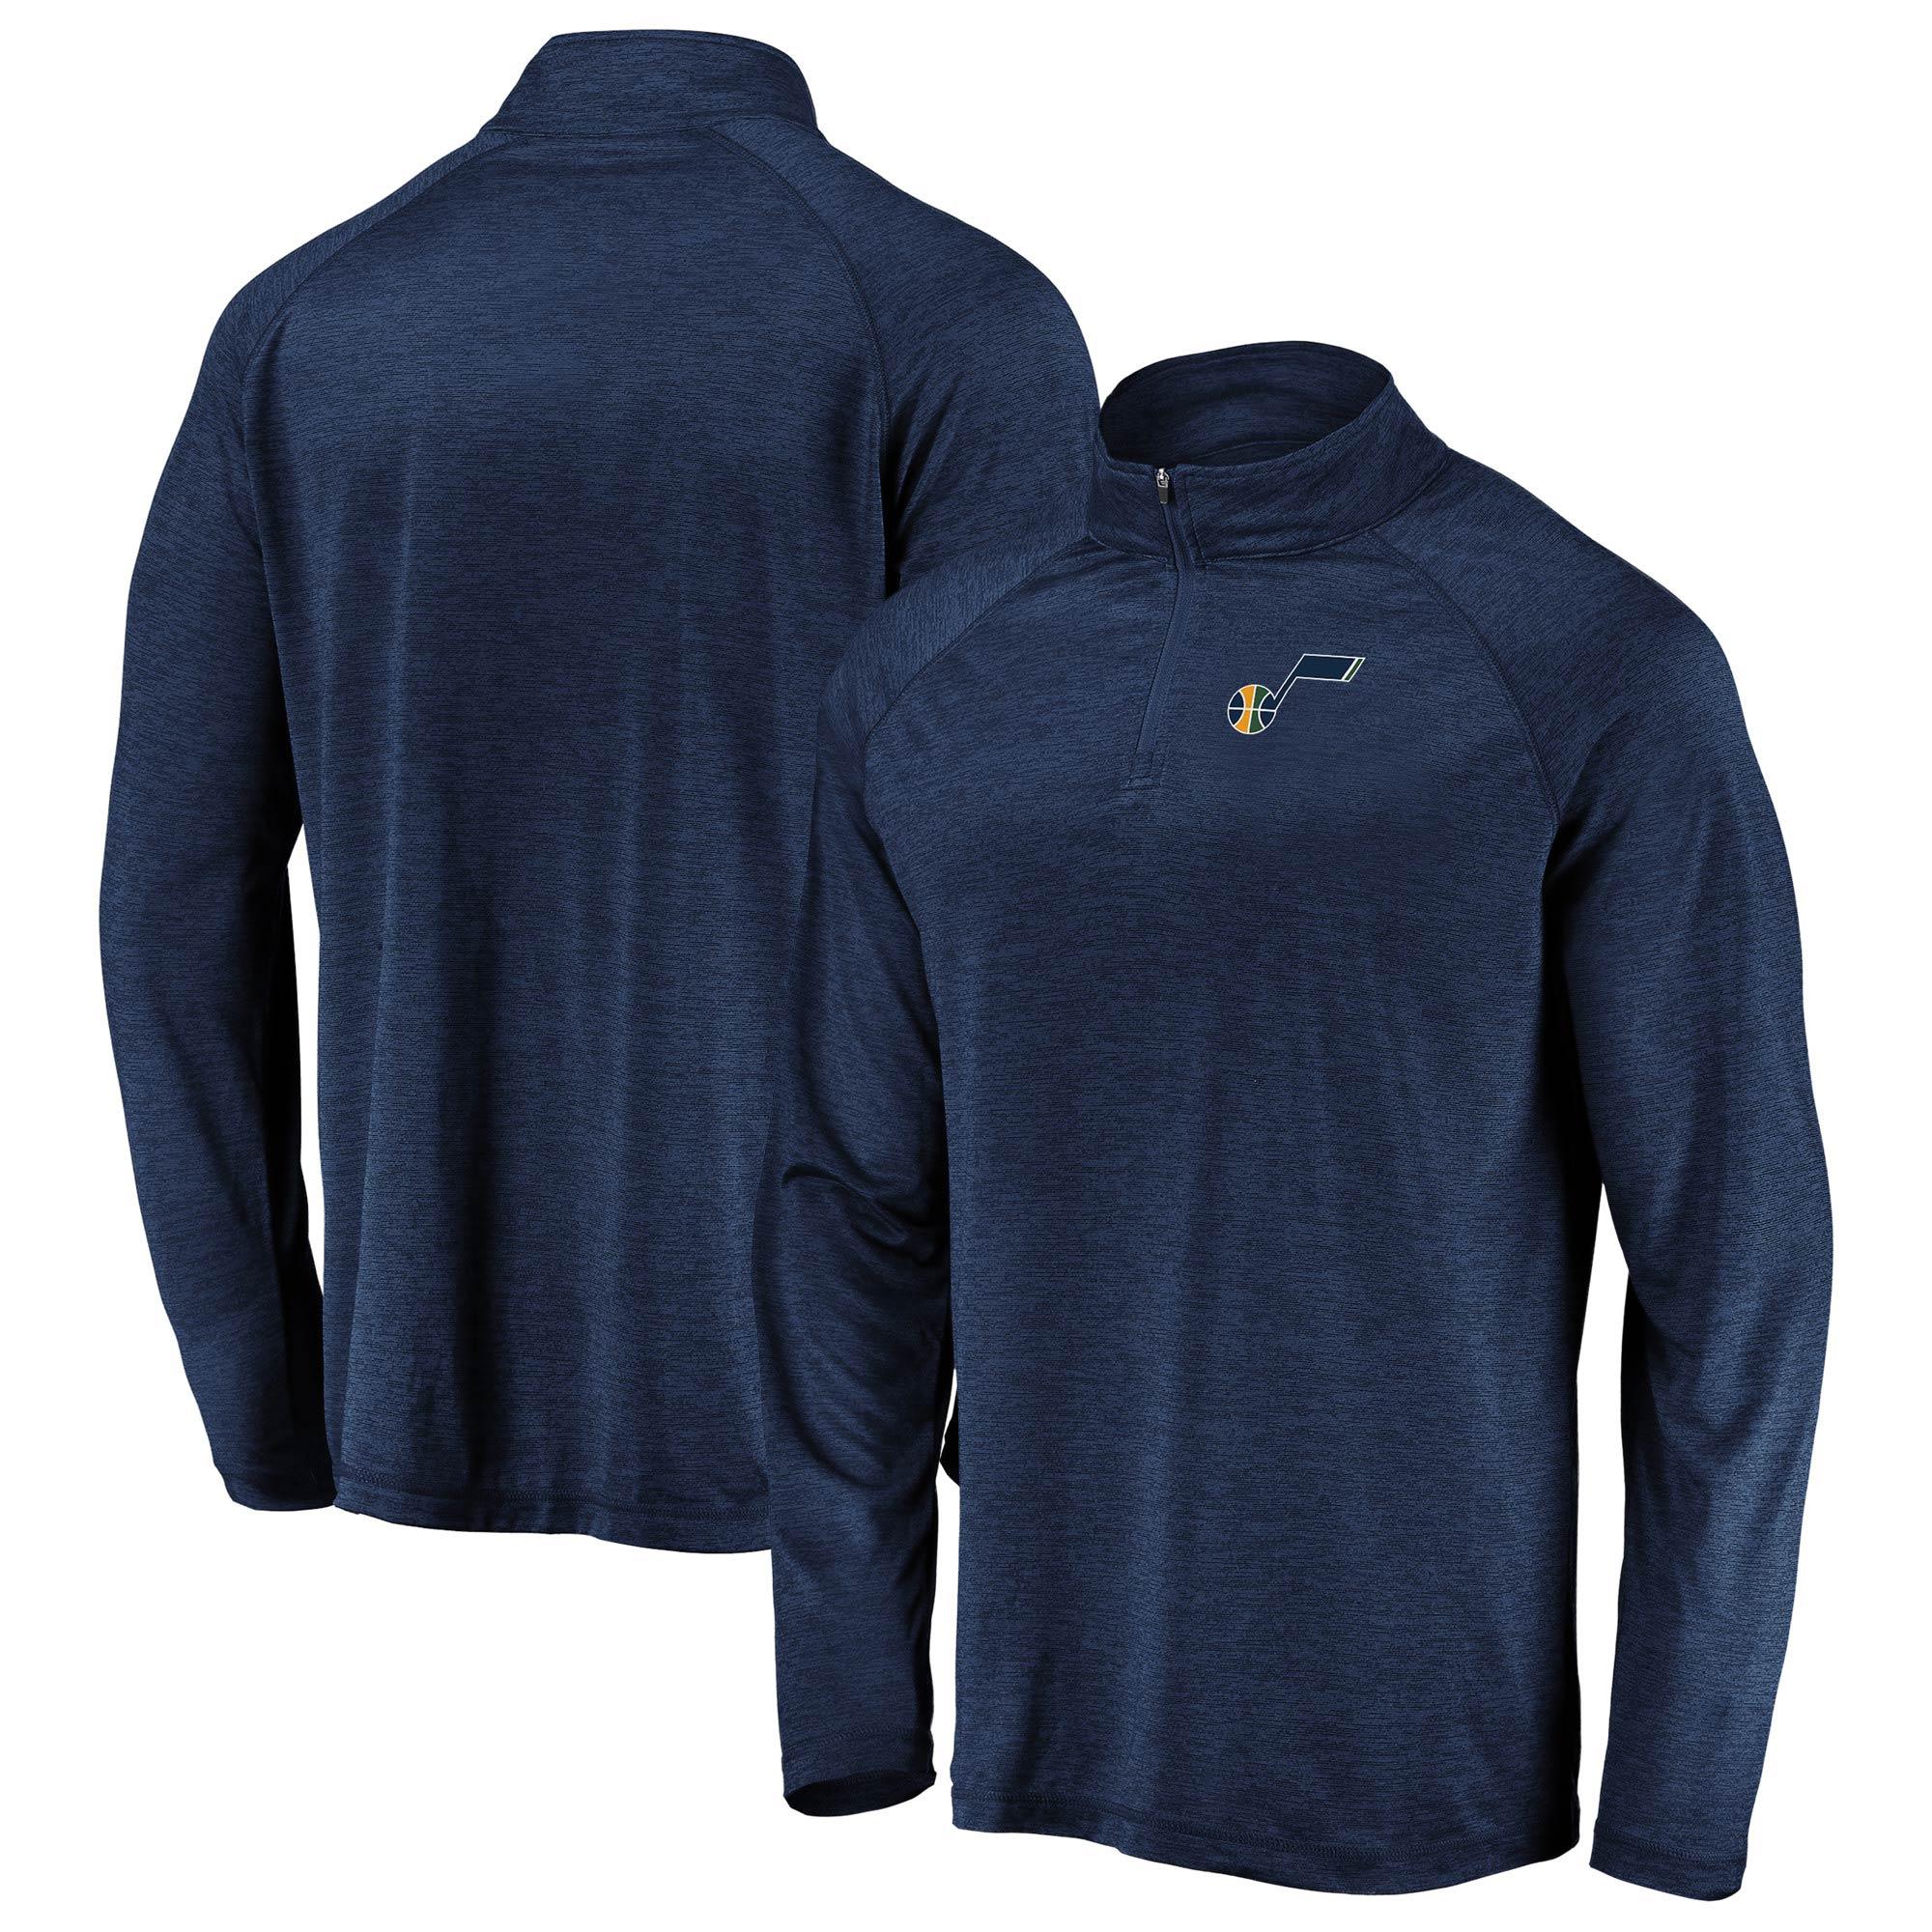 Utah Jazz Fanatics Branded Iconic Striated Raglan Quarter-Zip Pullover Jacket - Navy